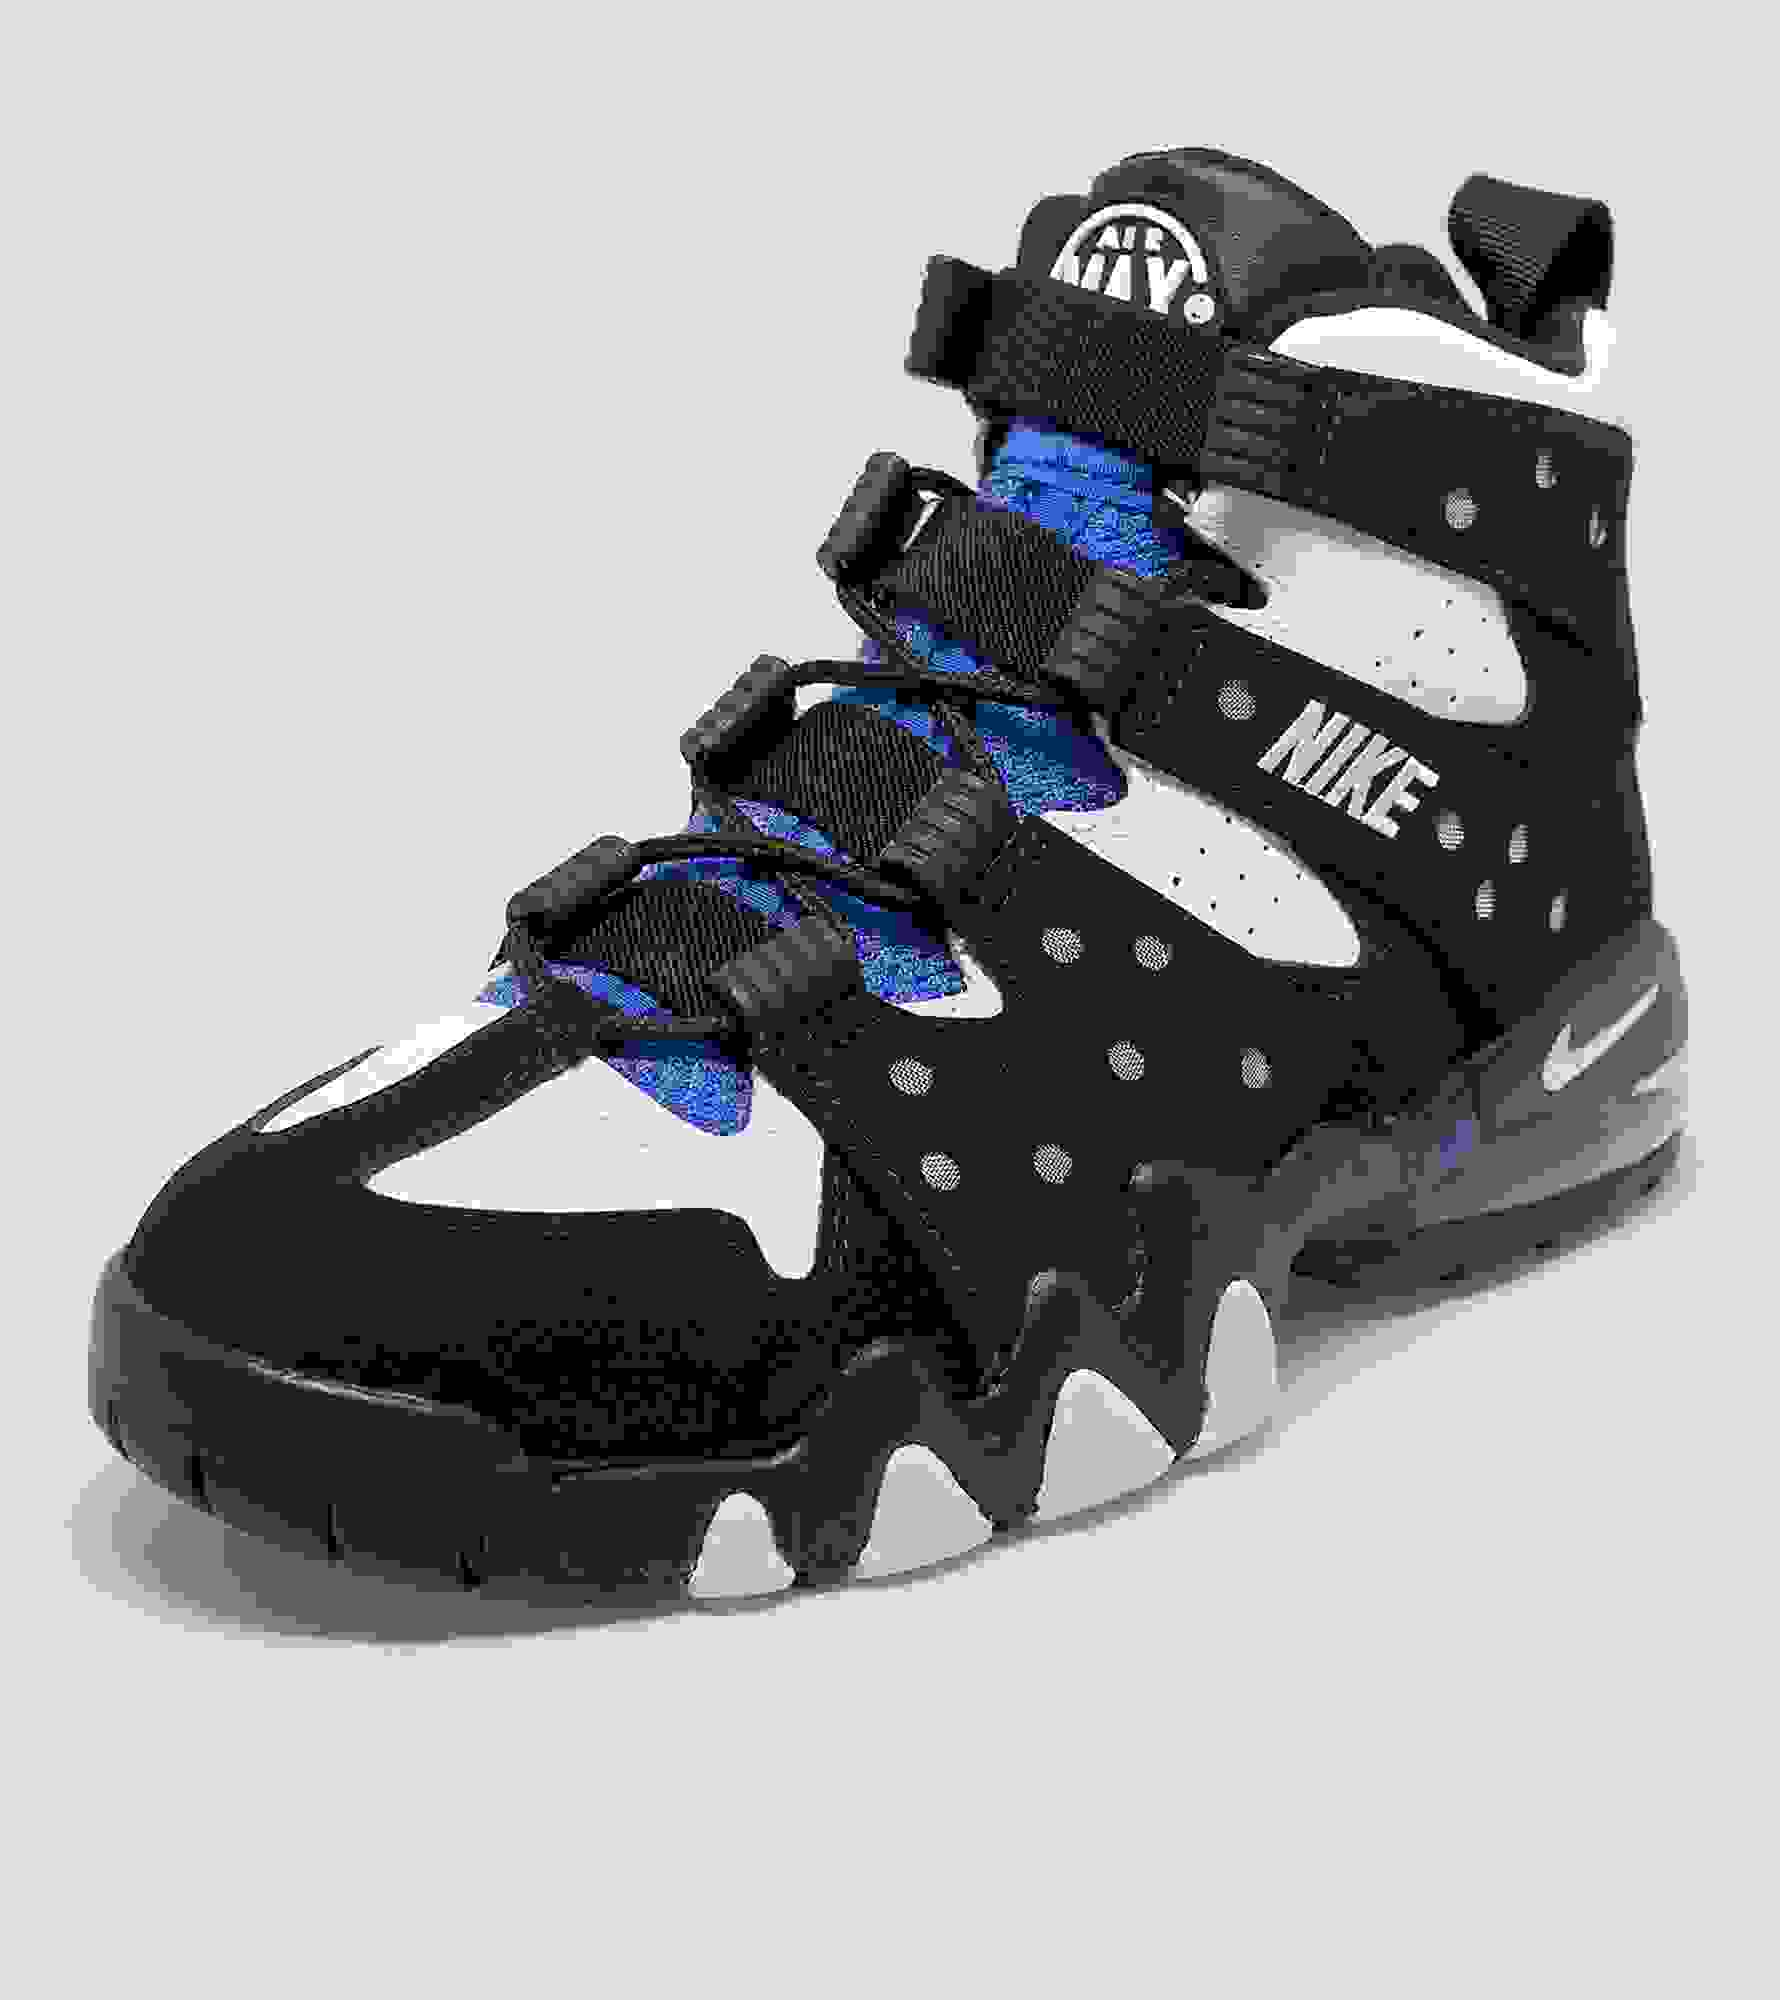 ca9b843ab0e Nike Womens Element Running Hoodie Shoes Nike Air Ultra Force Low ...